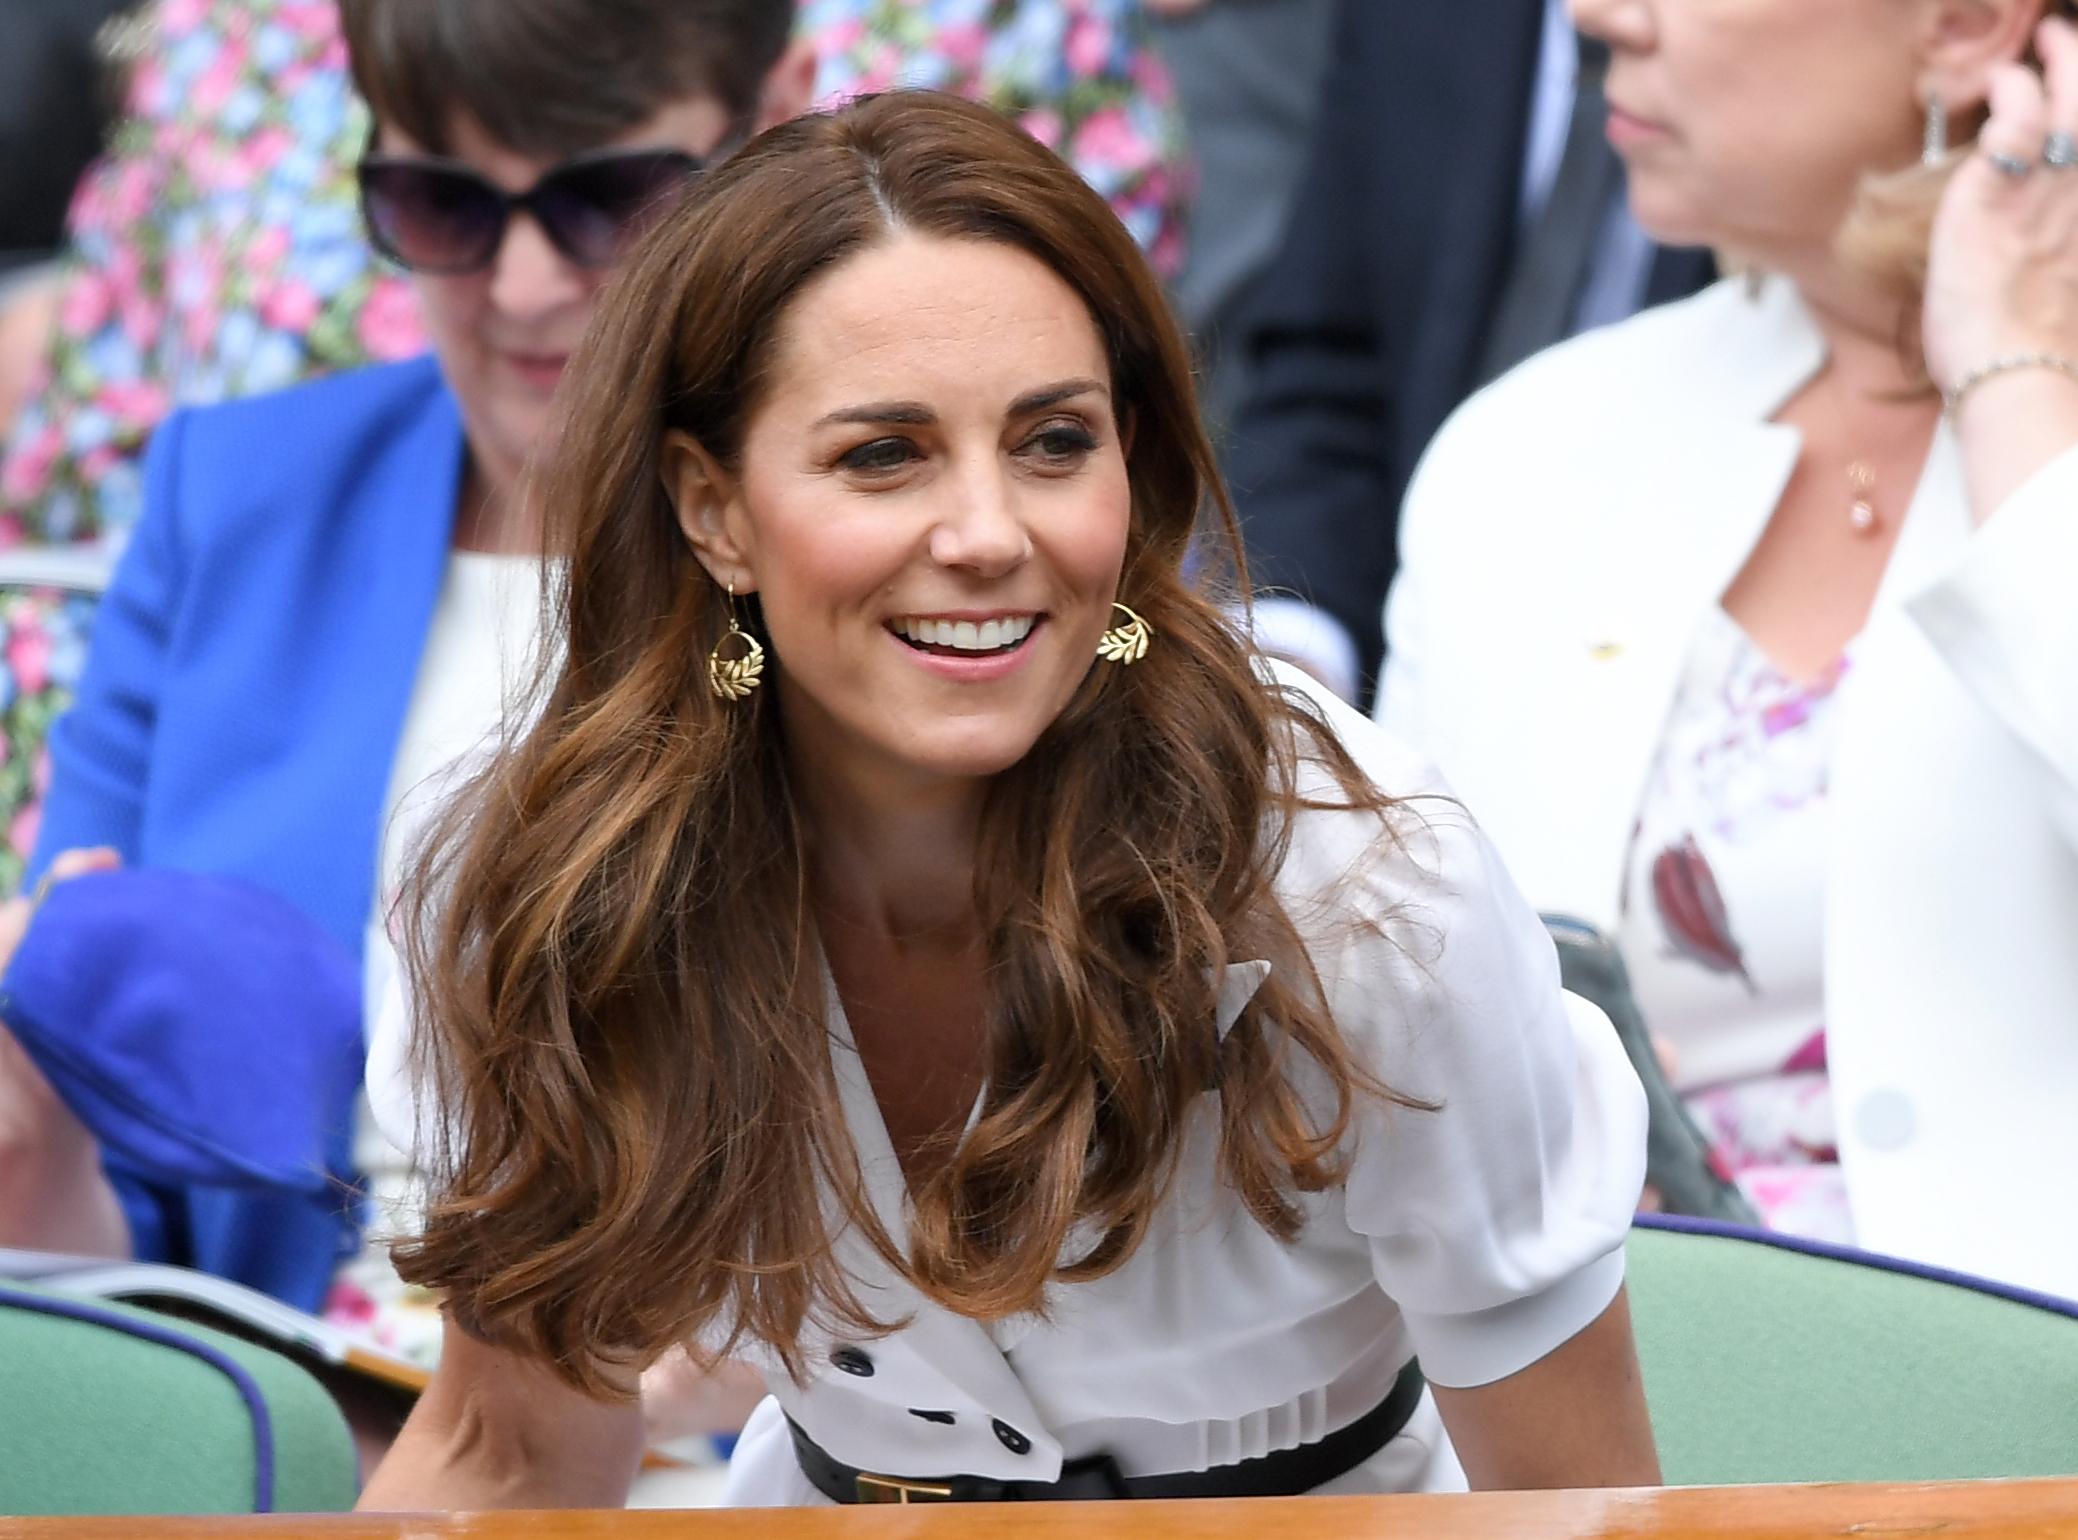 Kate Middleton makes huge change to her royal hairstyle during lockdown